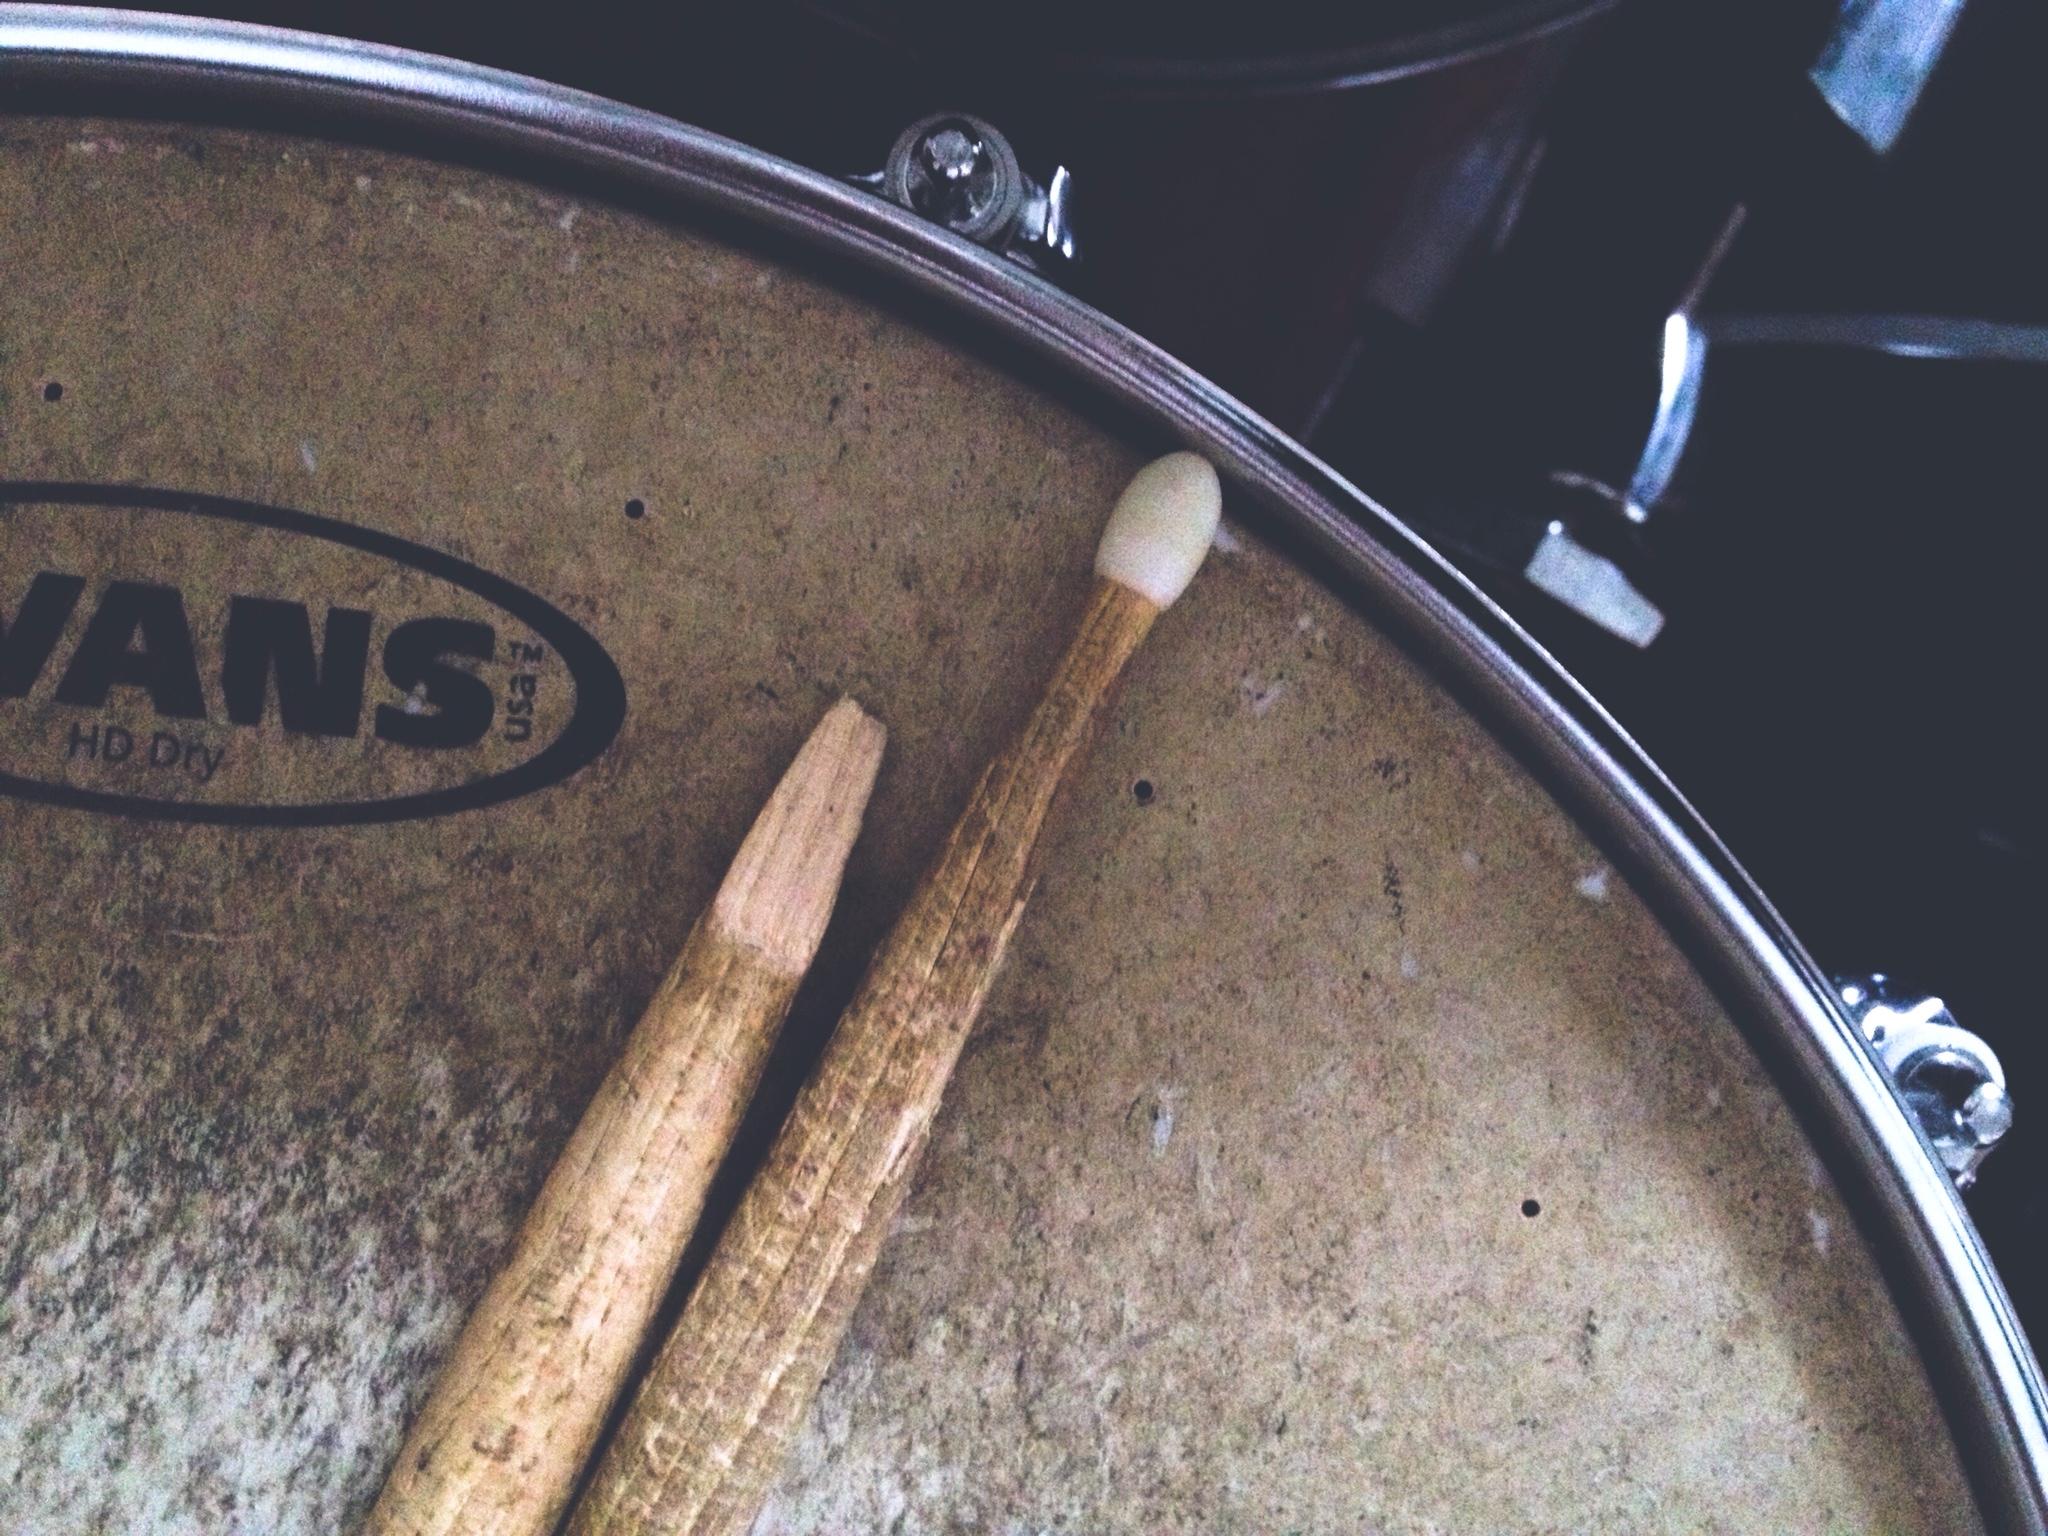 drumsticks and drumstick tips